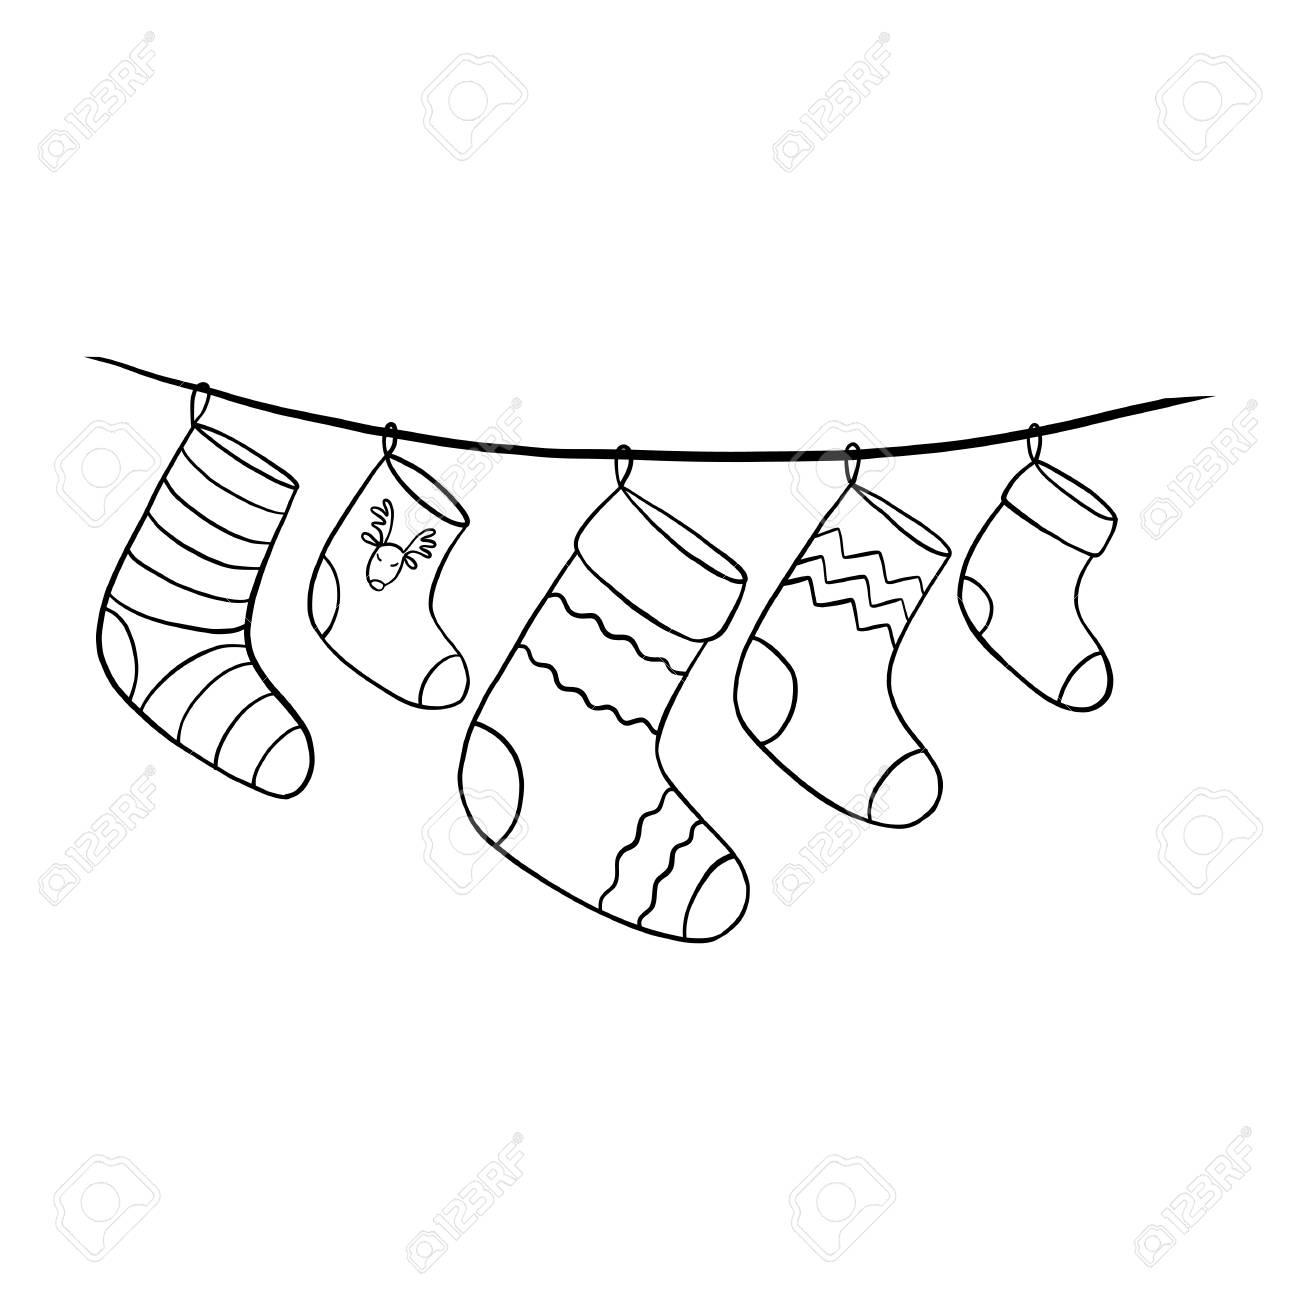 Christmas Stocking Line Drawing.A Vector Christmas Socks Hand Drawn Vector Illustration